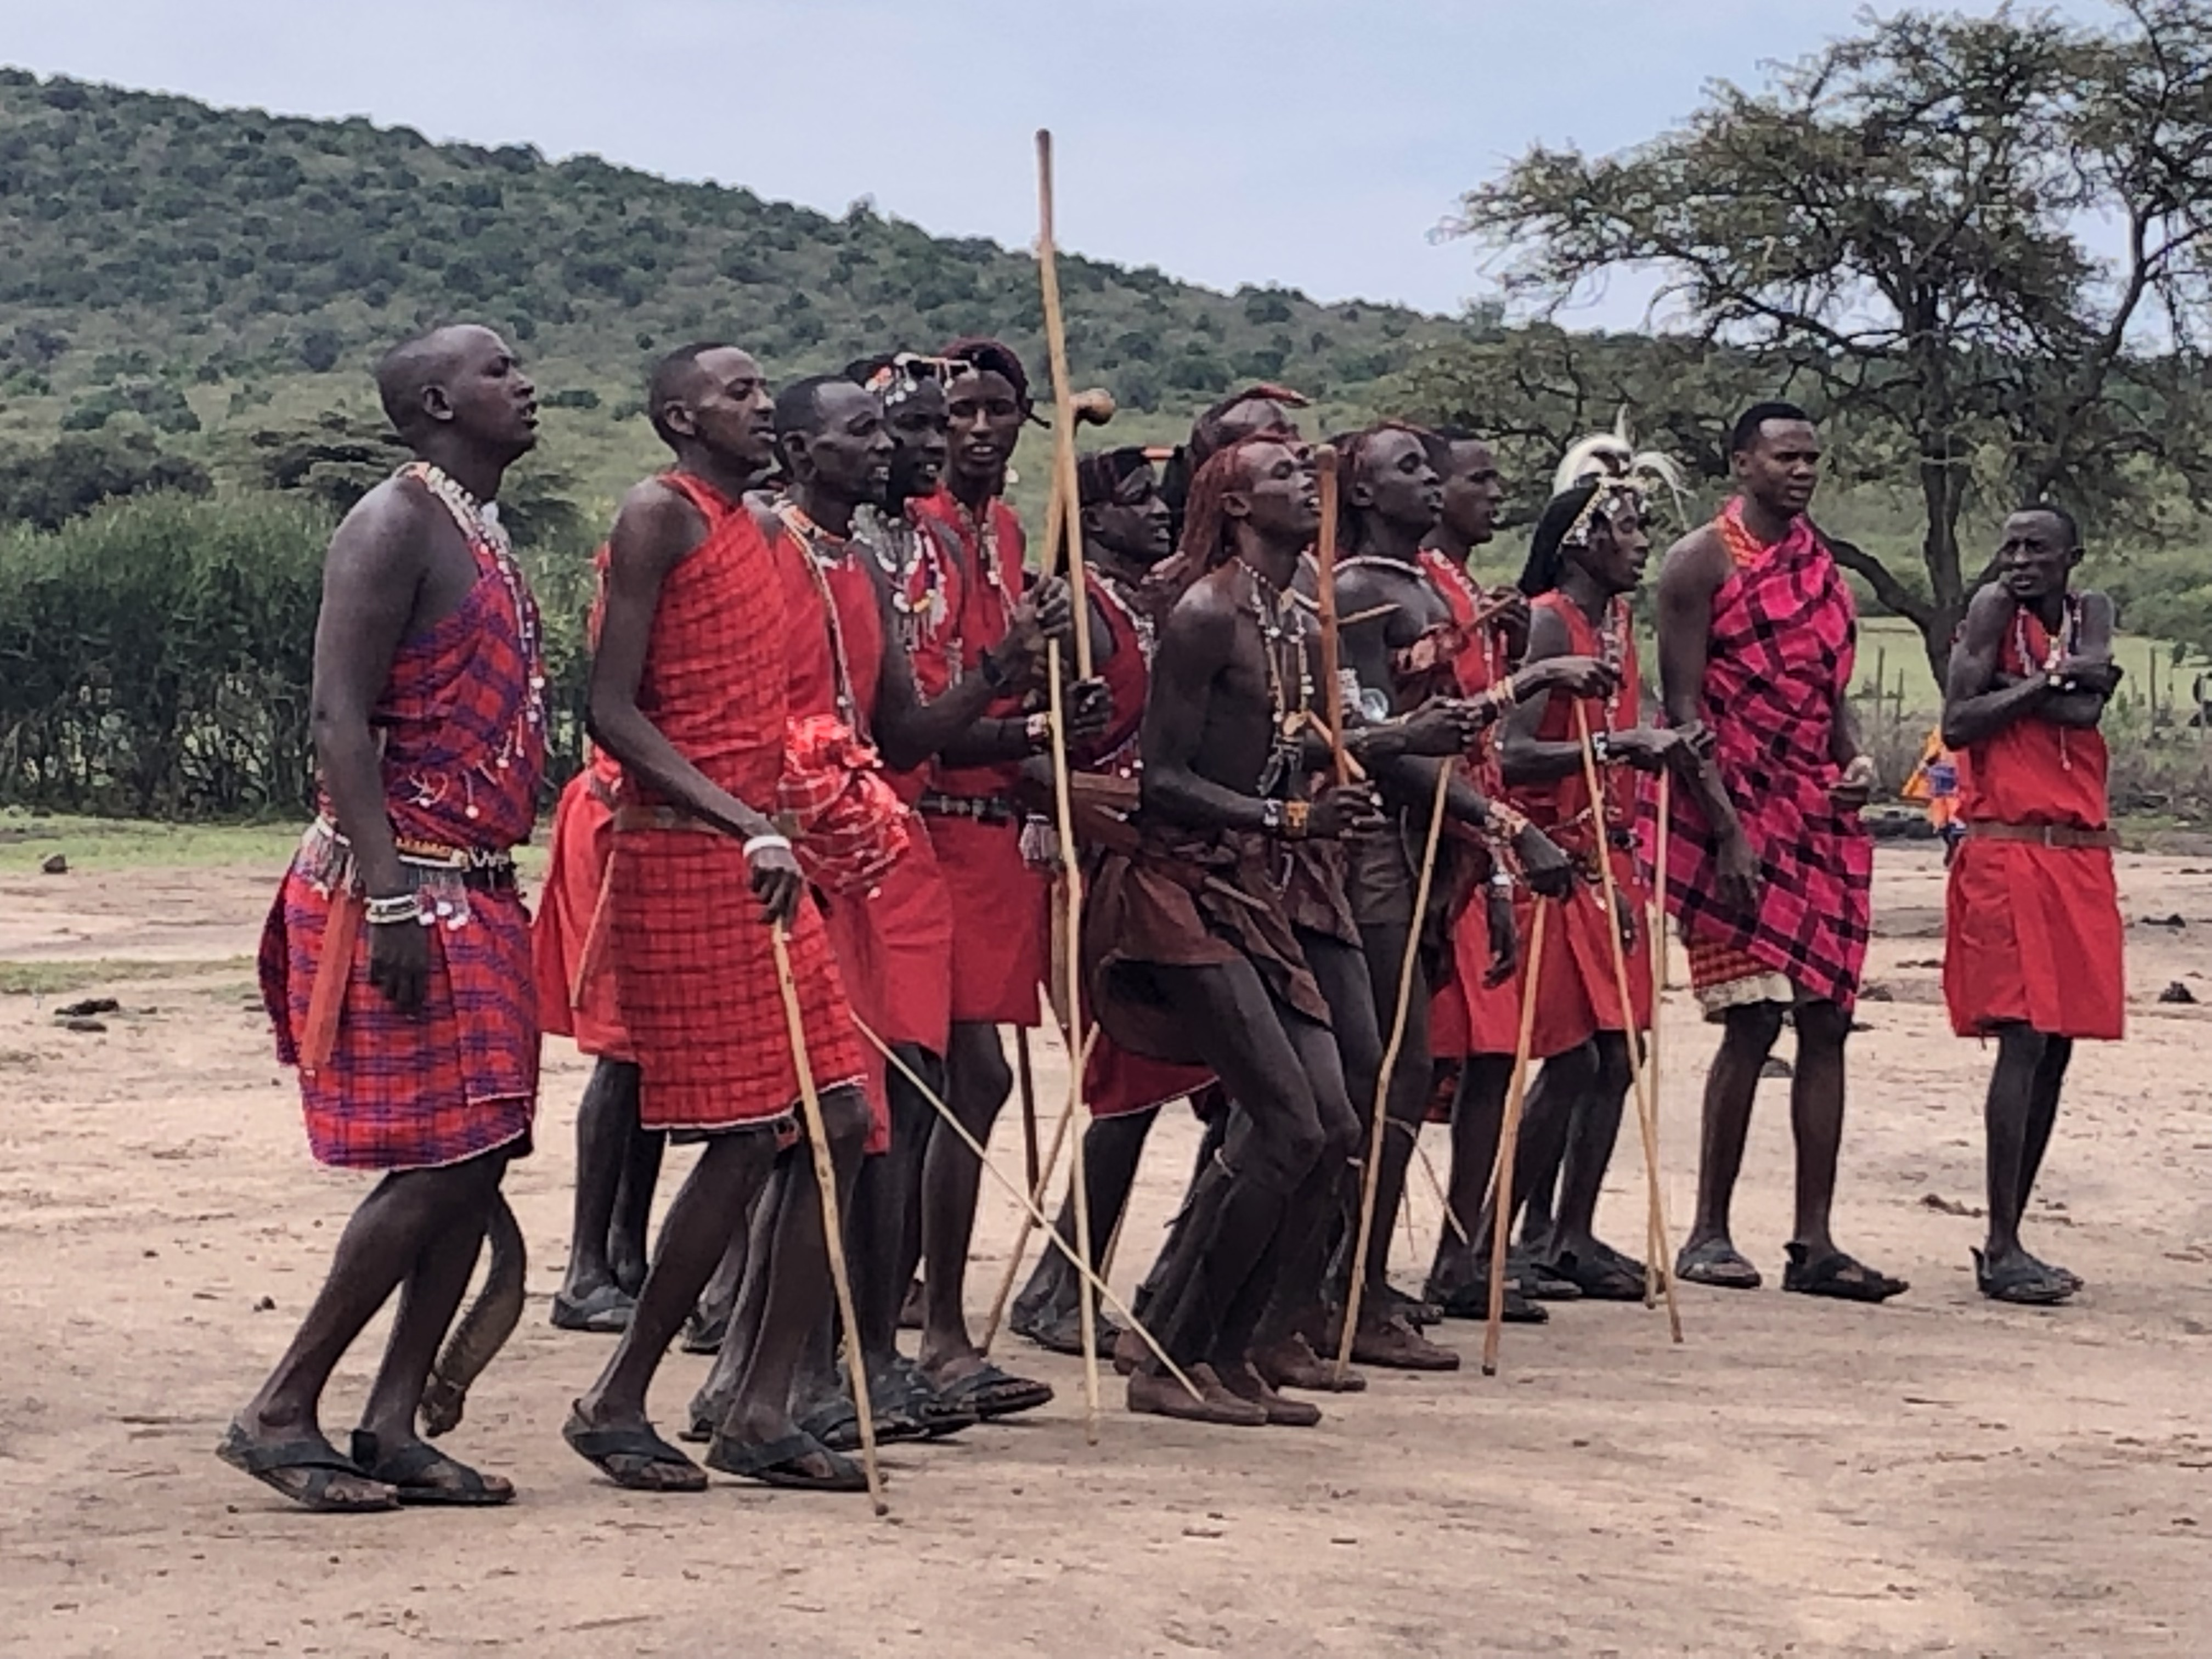 Maasai Mara village